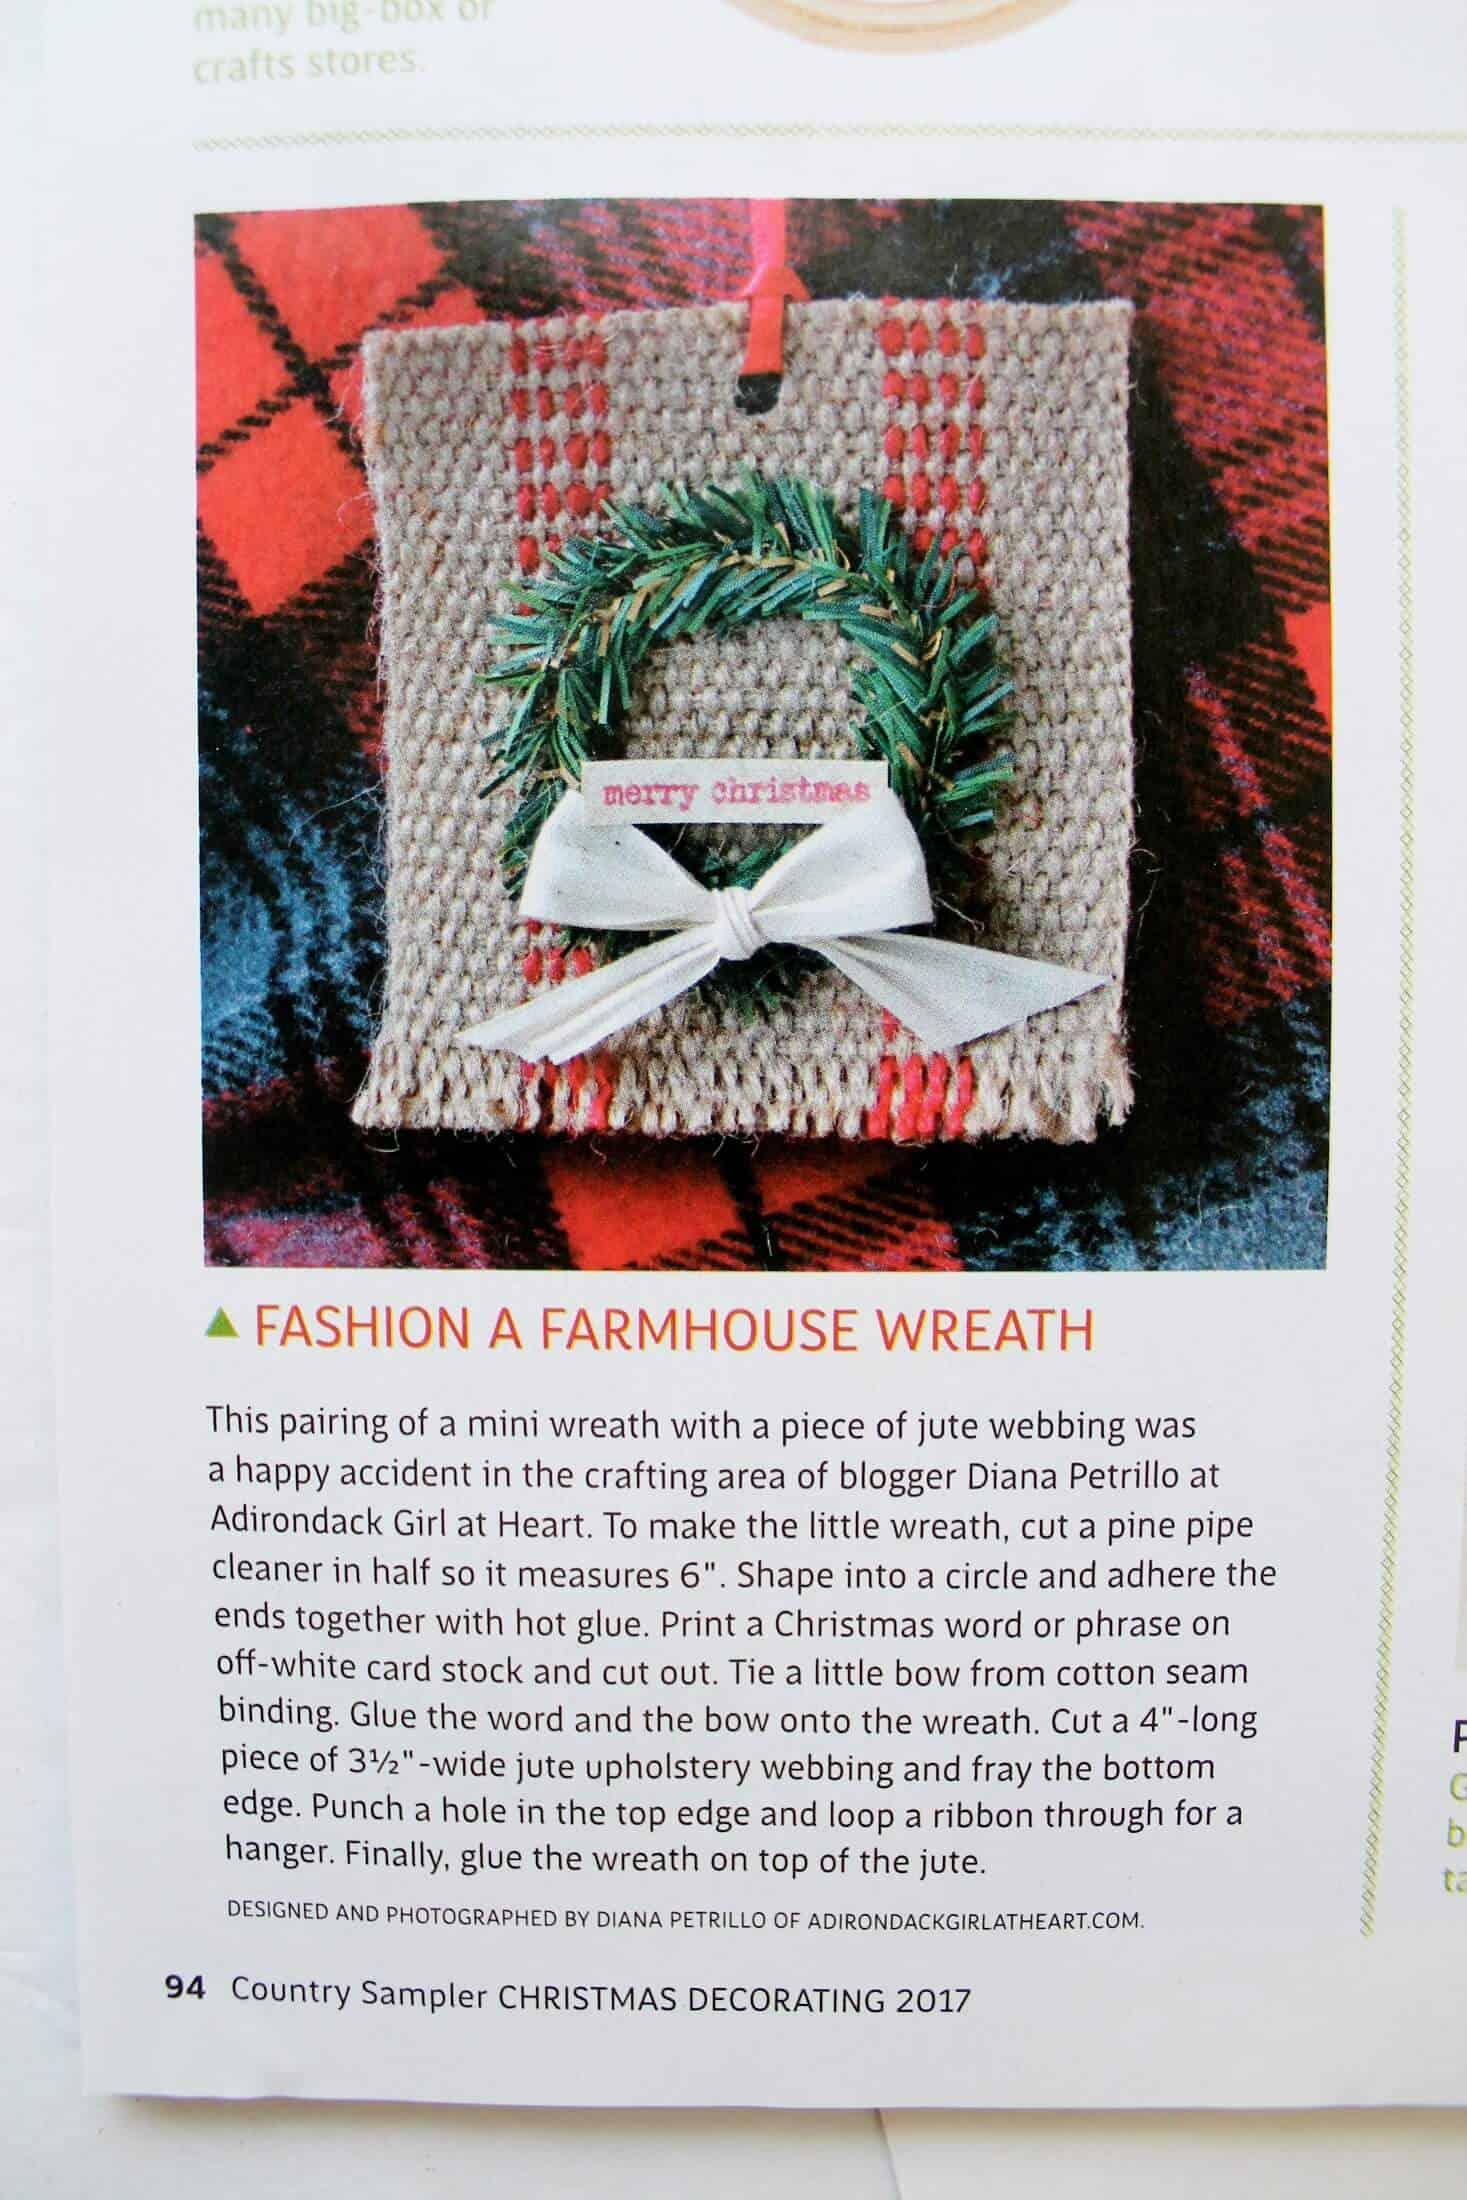 magazine article with farmhouse ornament